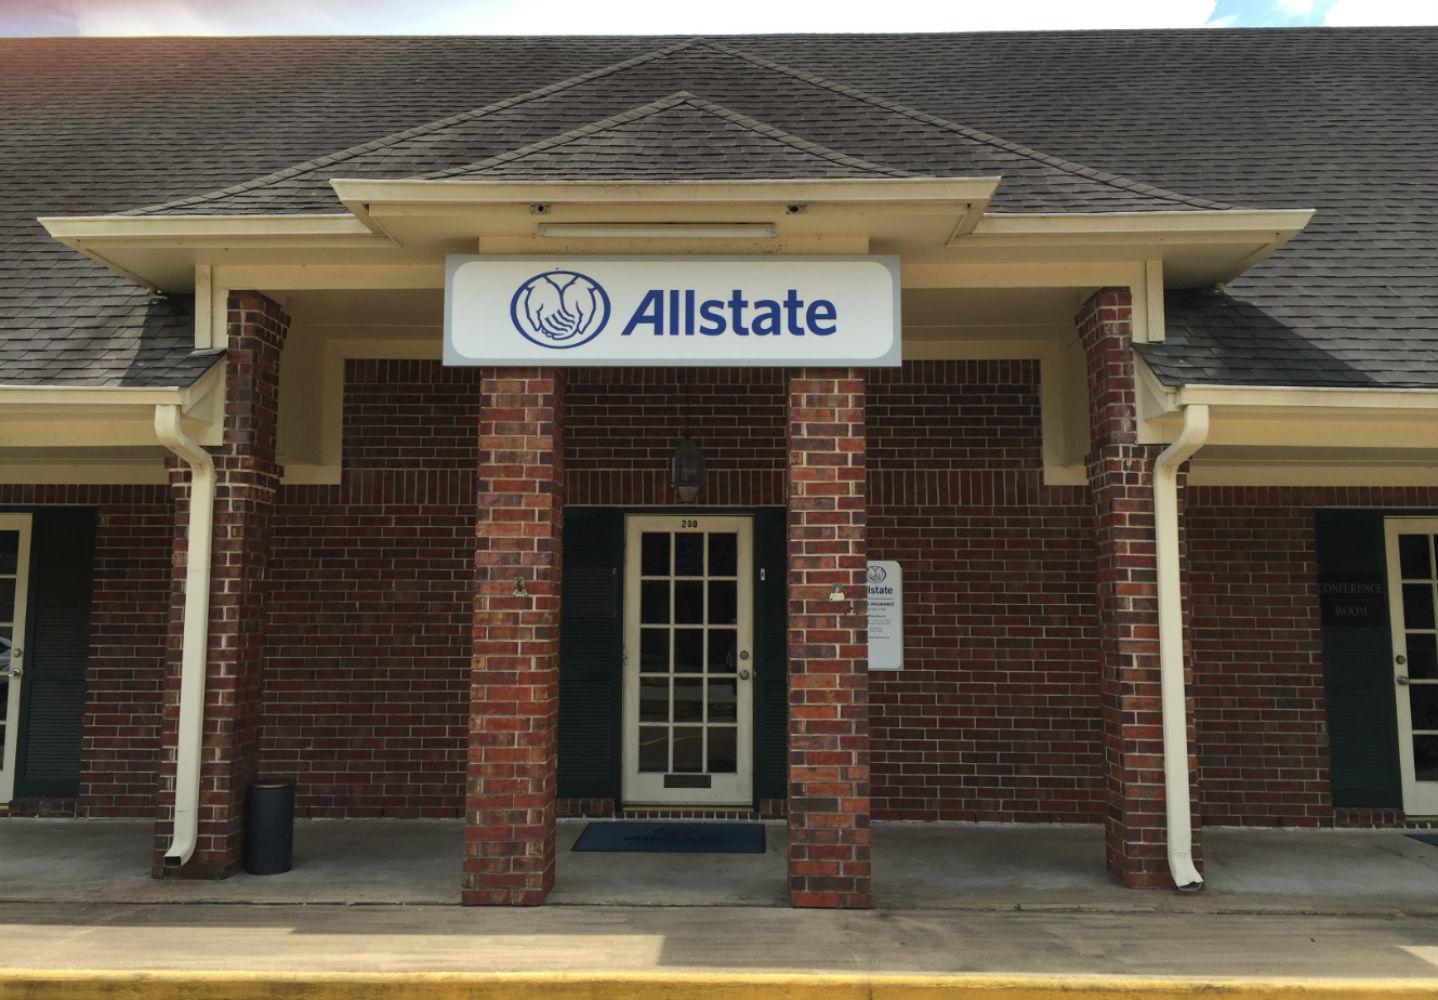 Shield Insurance Agency: Allstate Insurance image 1